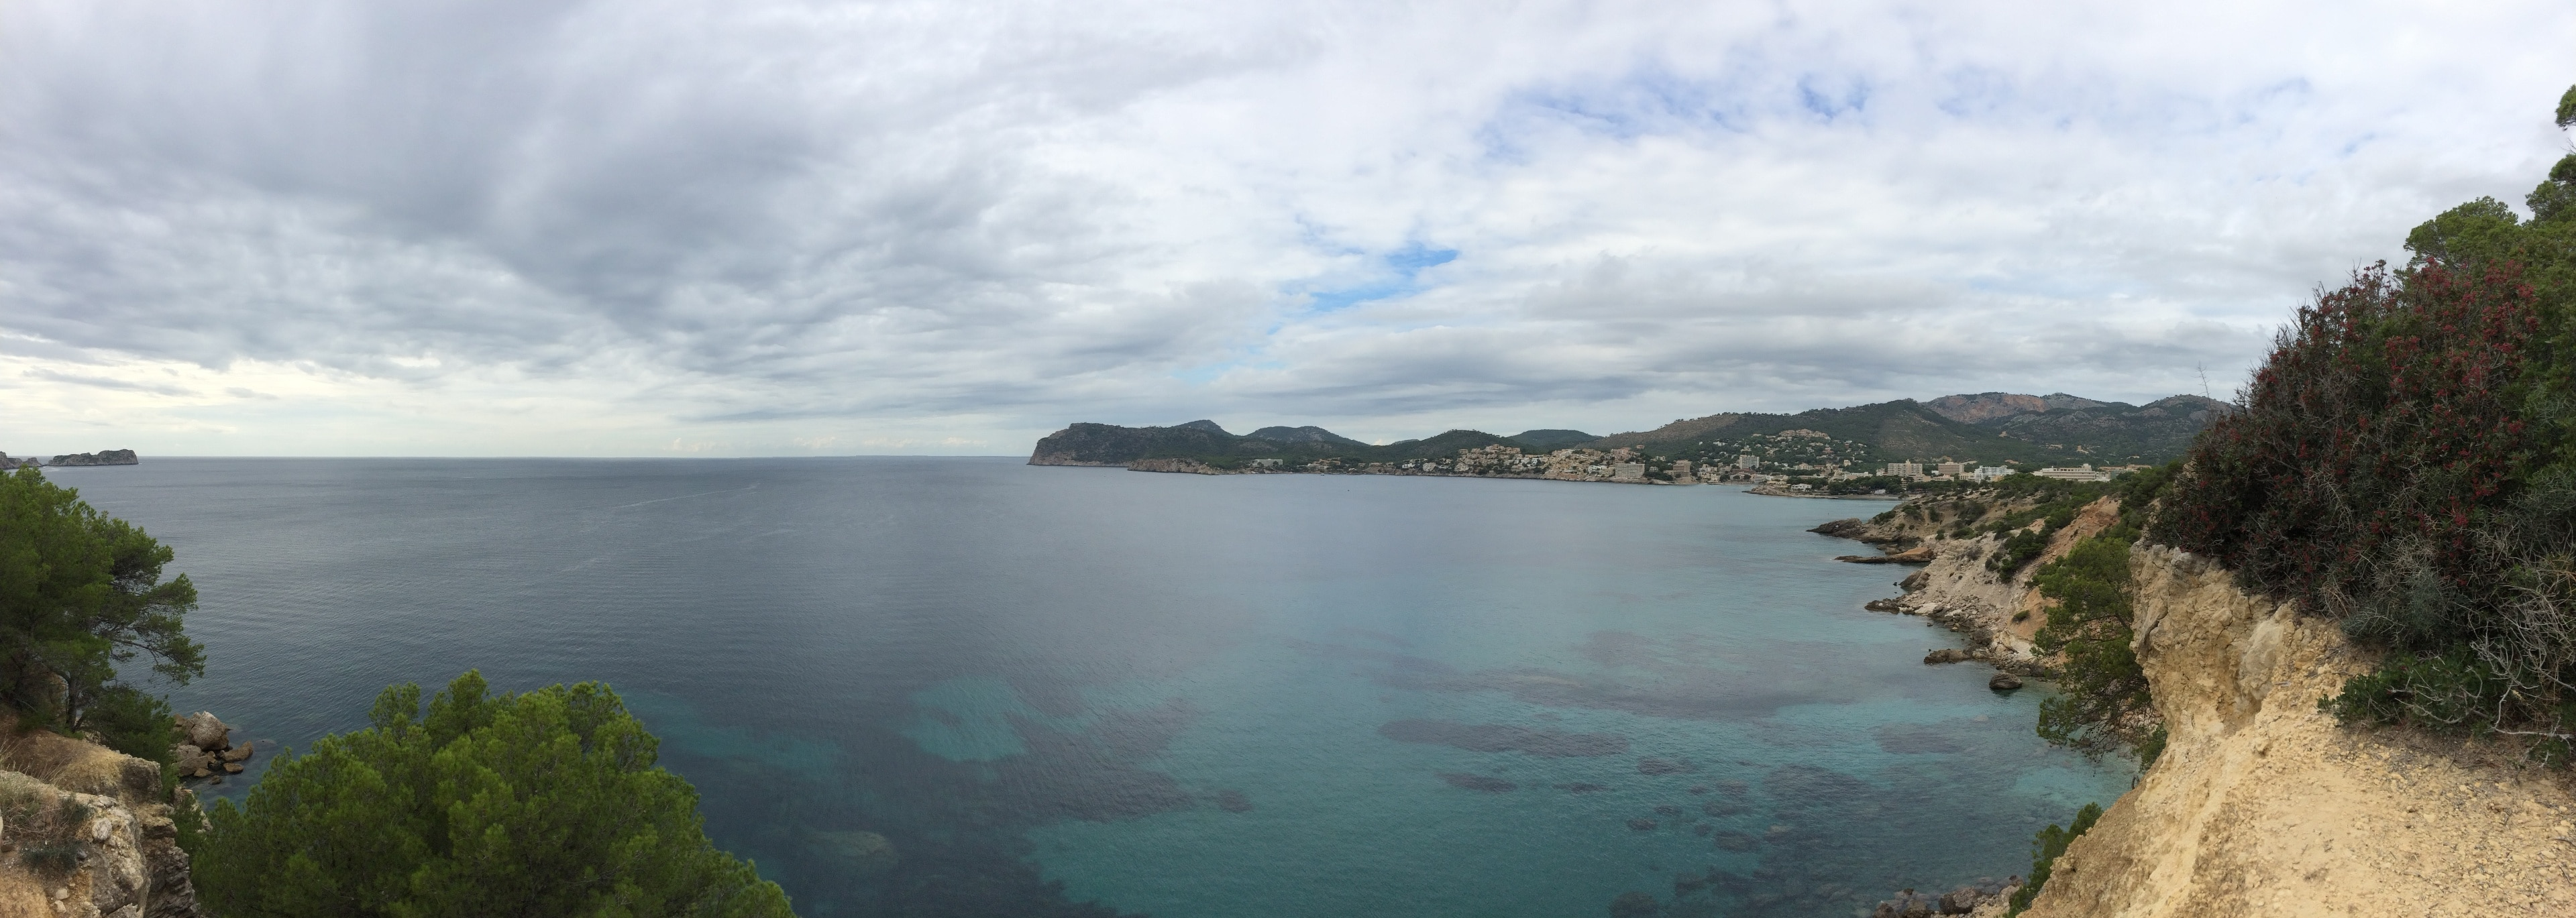 Costa de la Calma, Calvia, Balearic Islands, Spain